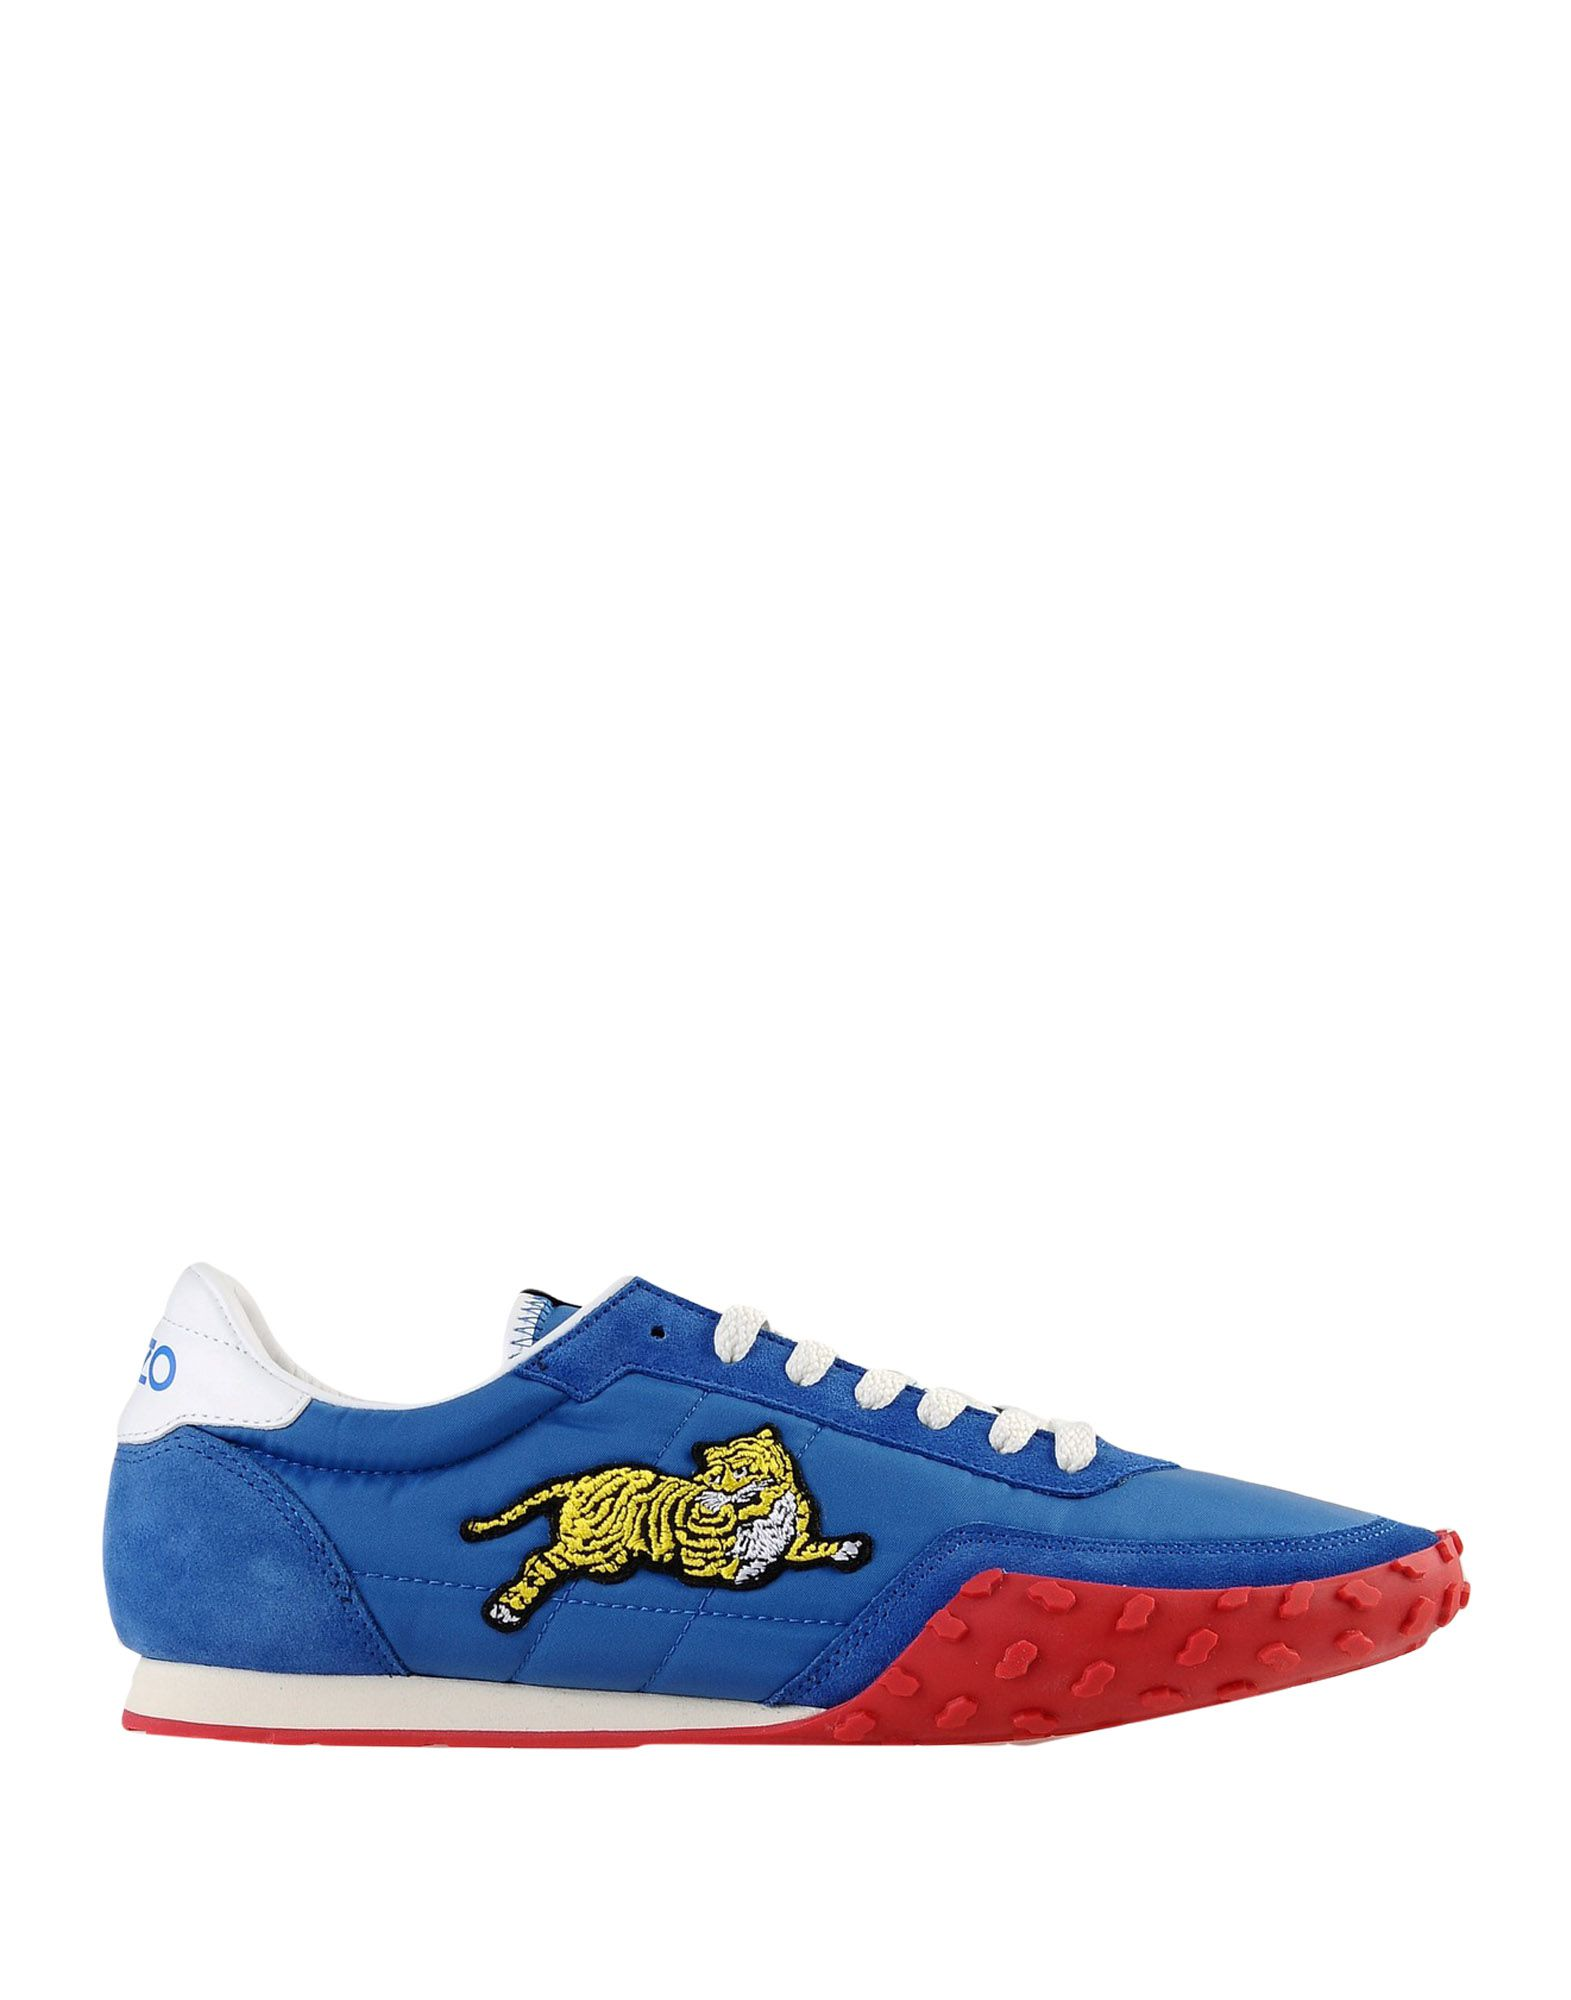 Sneakers Kenzo Homme - Sneakers Kenzo  Bleu Meilleur modèle de vente